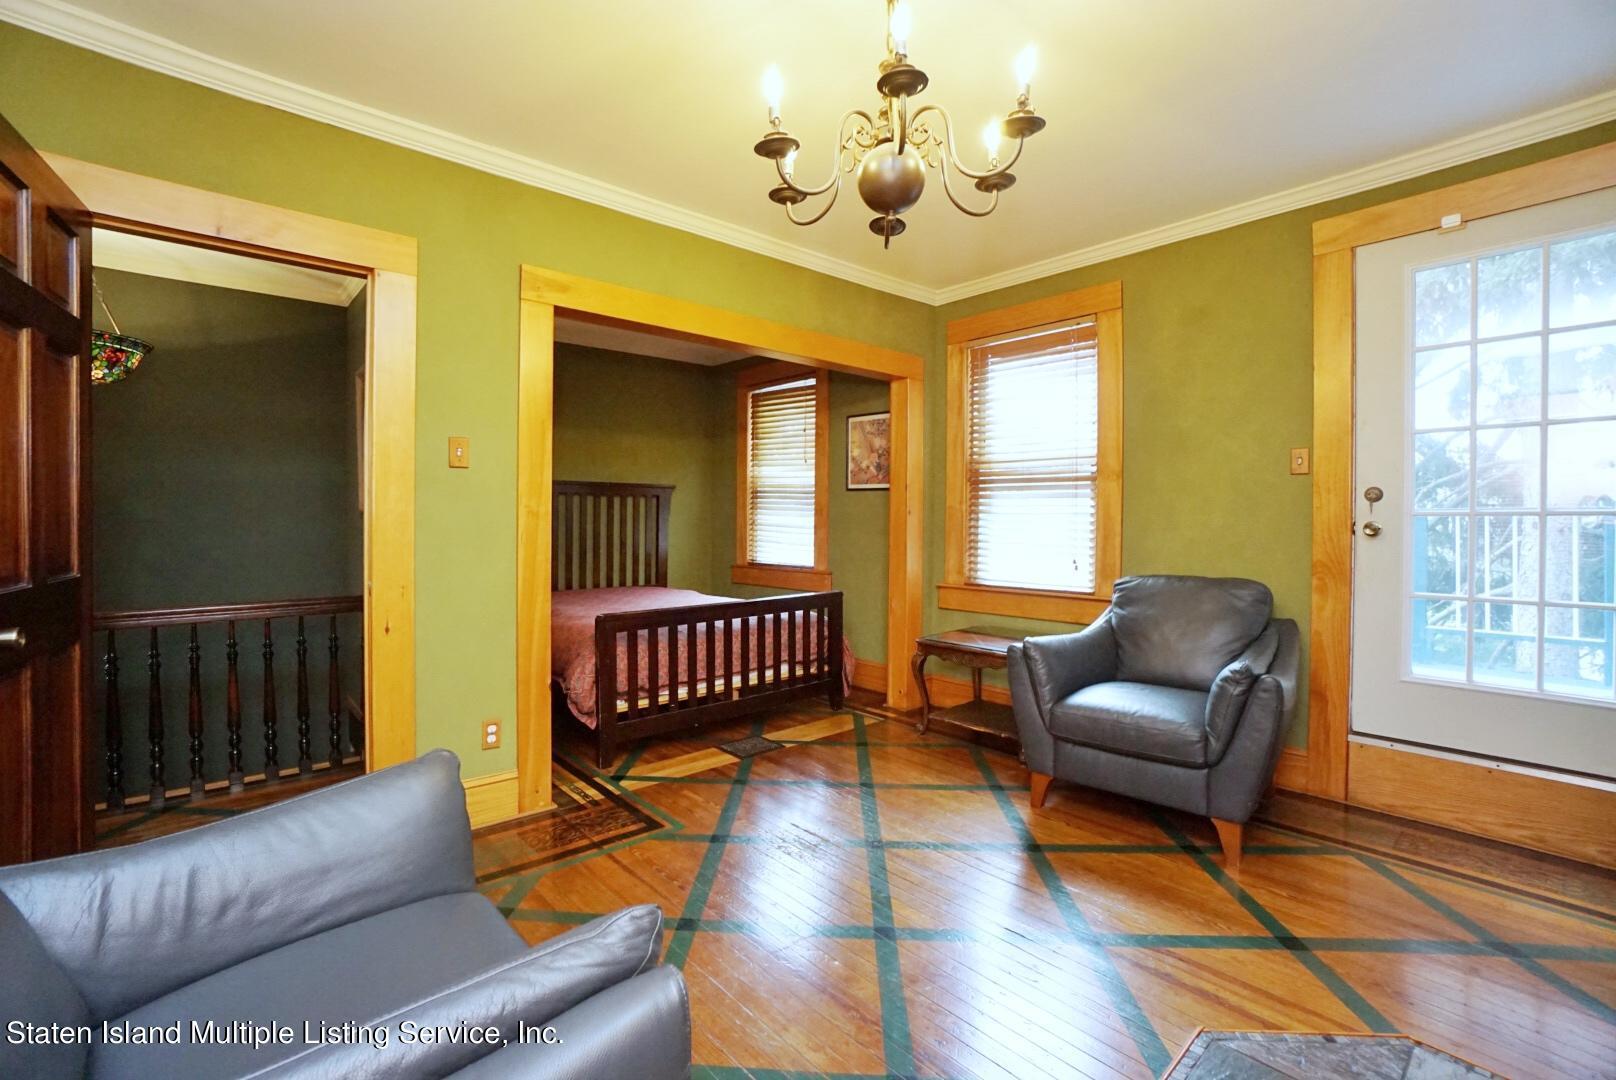 Single Family - Detached 136 York Avenue  Staten Island, NY 10301, MLS-1147575-28